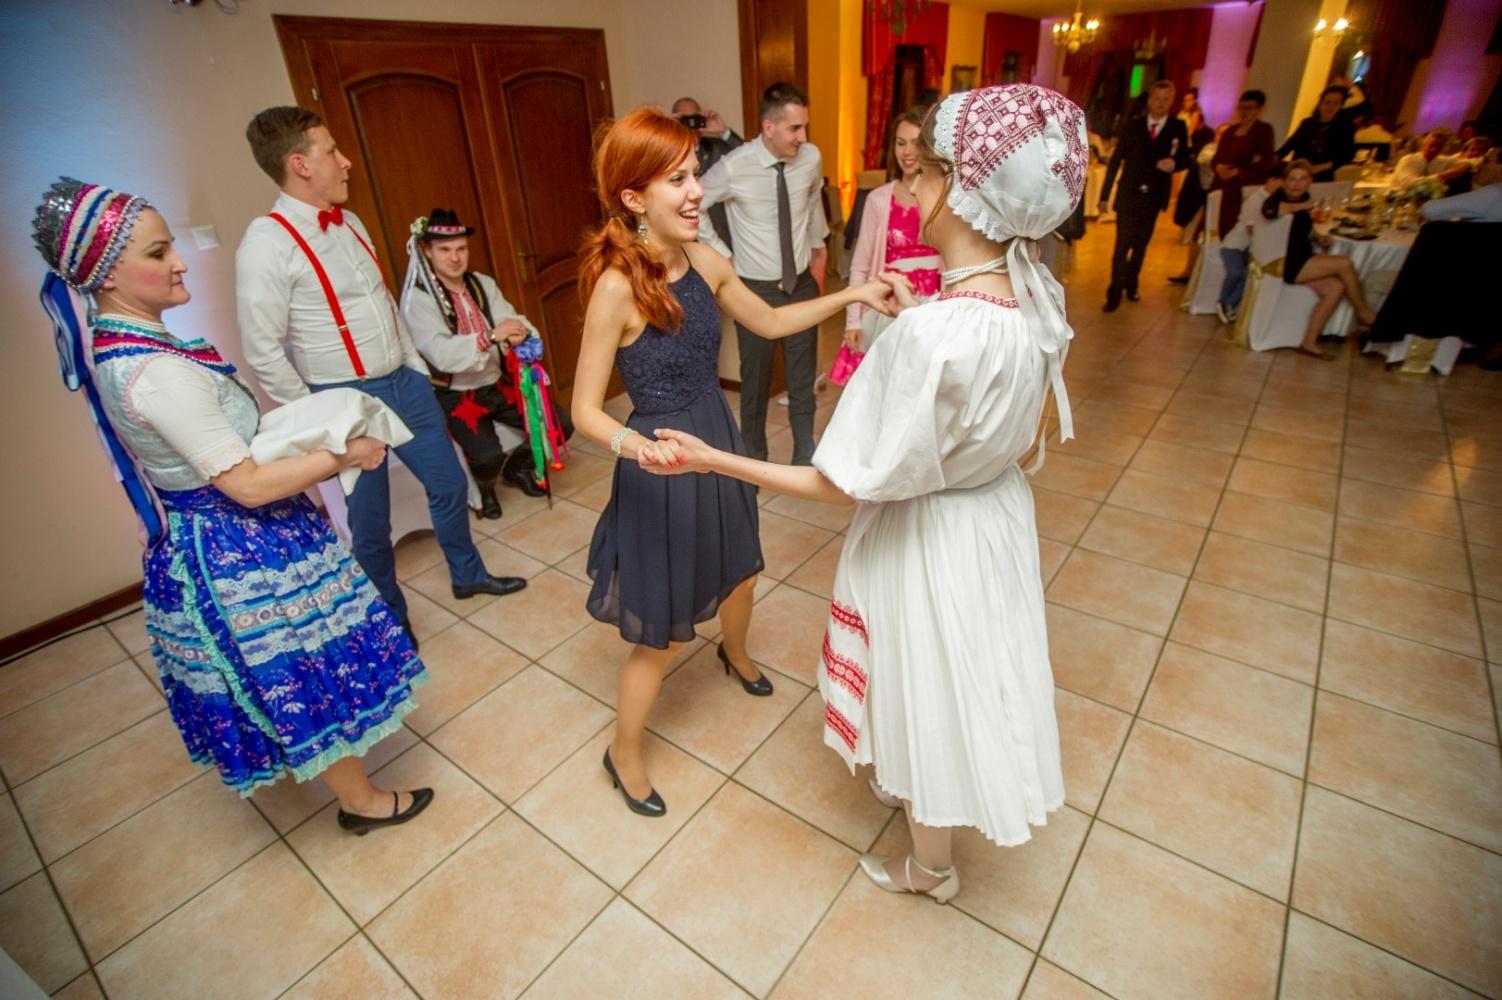 http://www.fotoz.sk/images/gallery-23/normal/svadba-_sv_petrus-vini_181.jpg